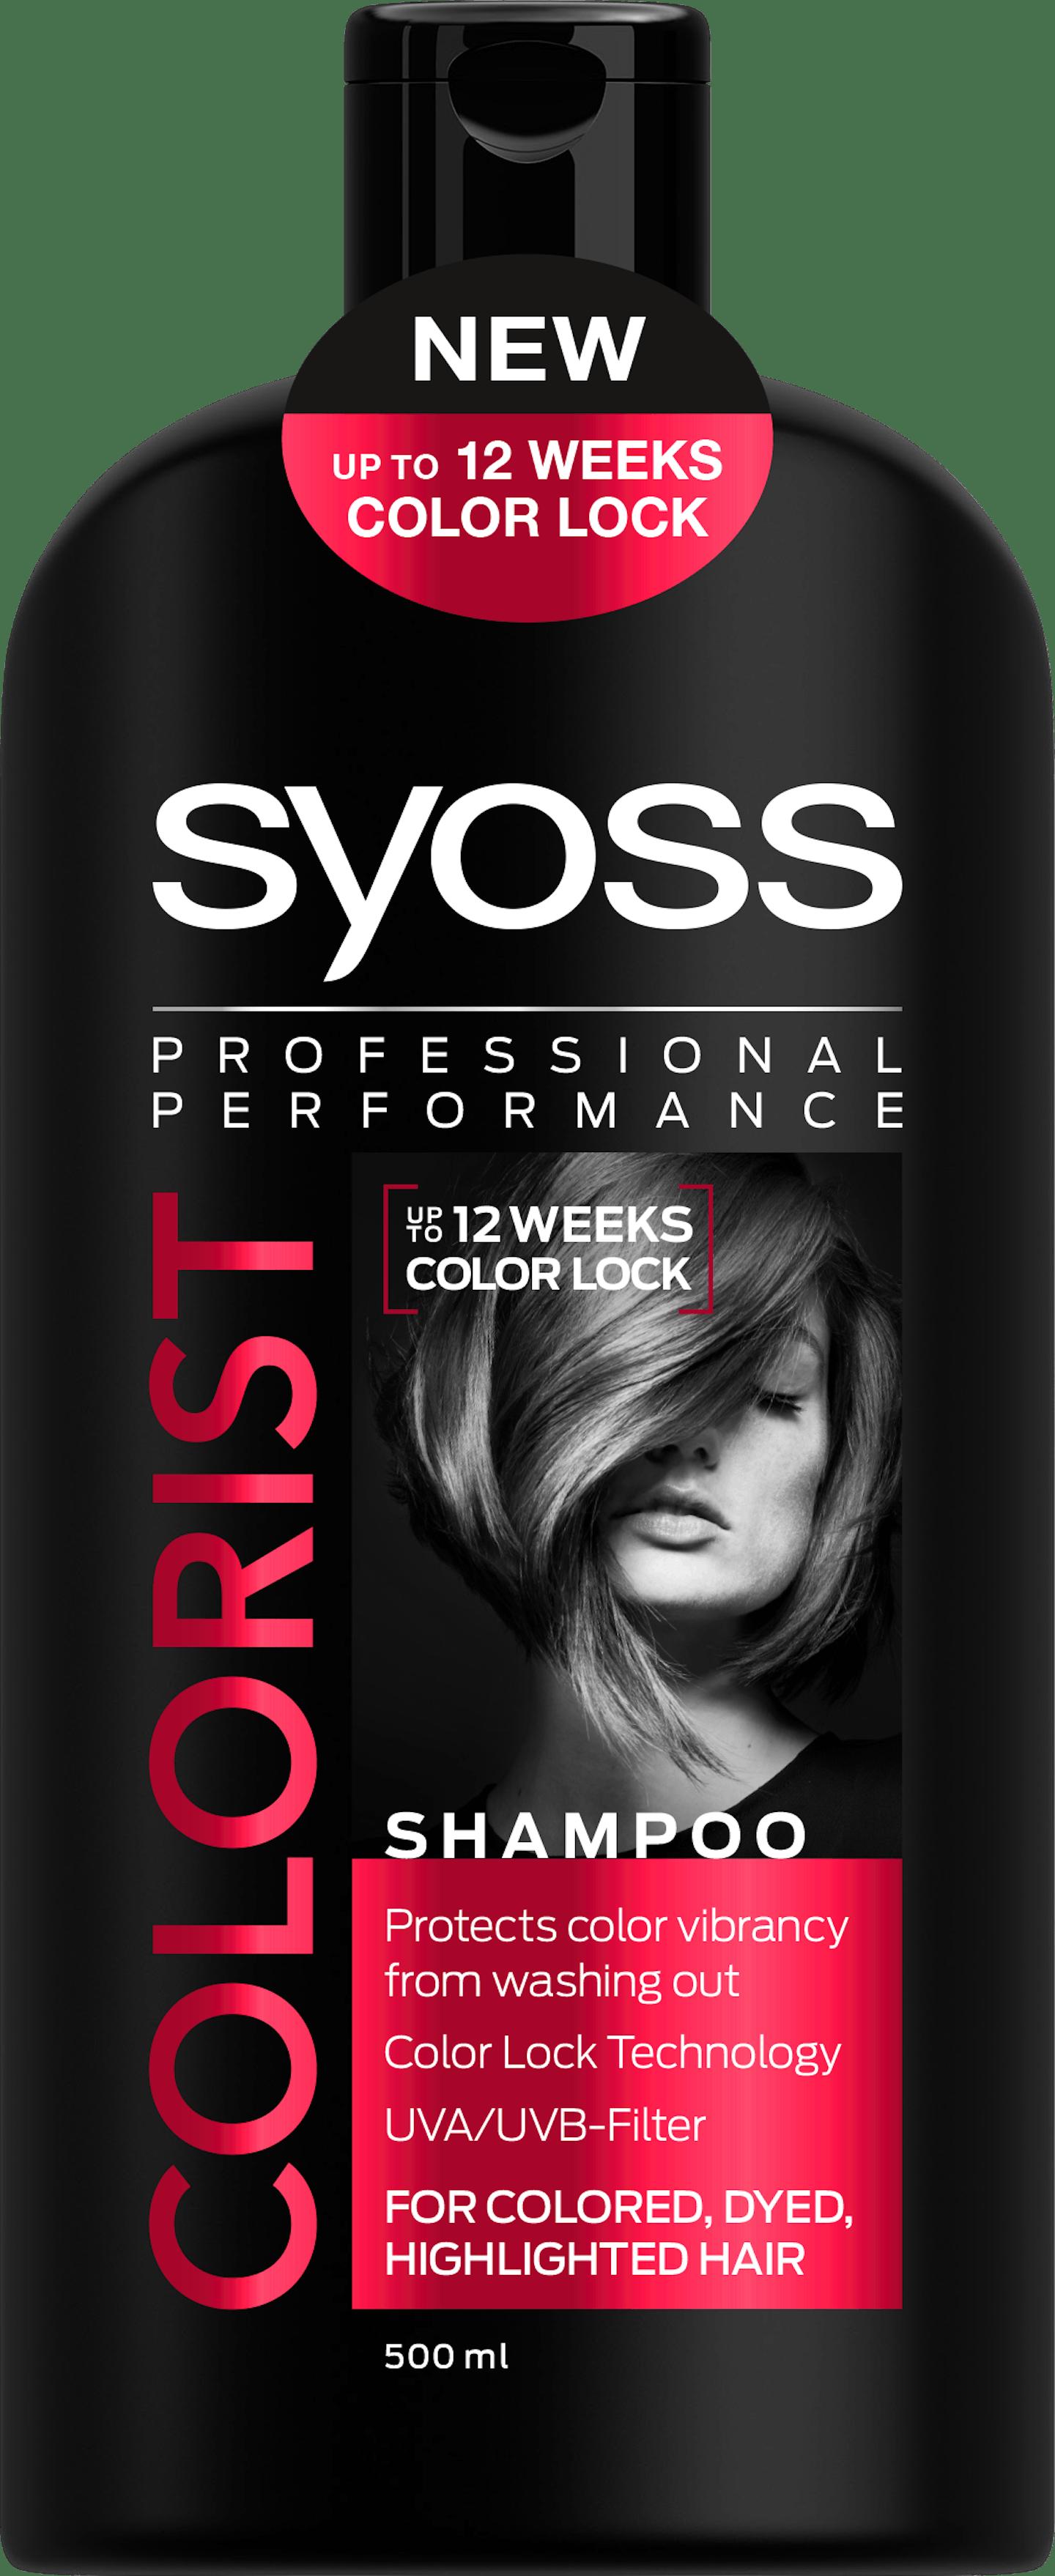 Syoss Colorist Shampoo